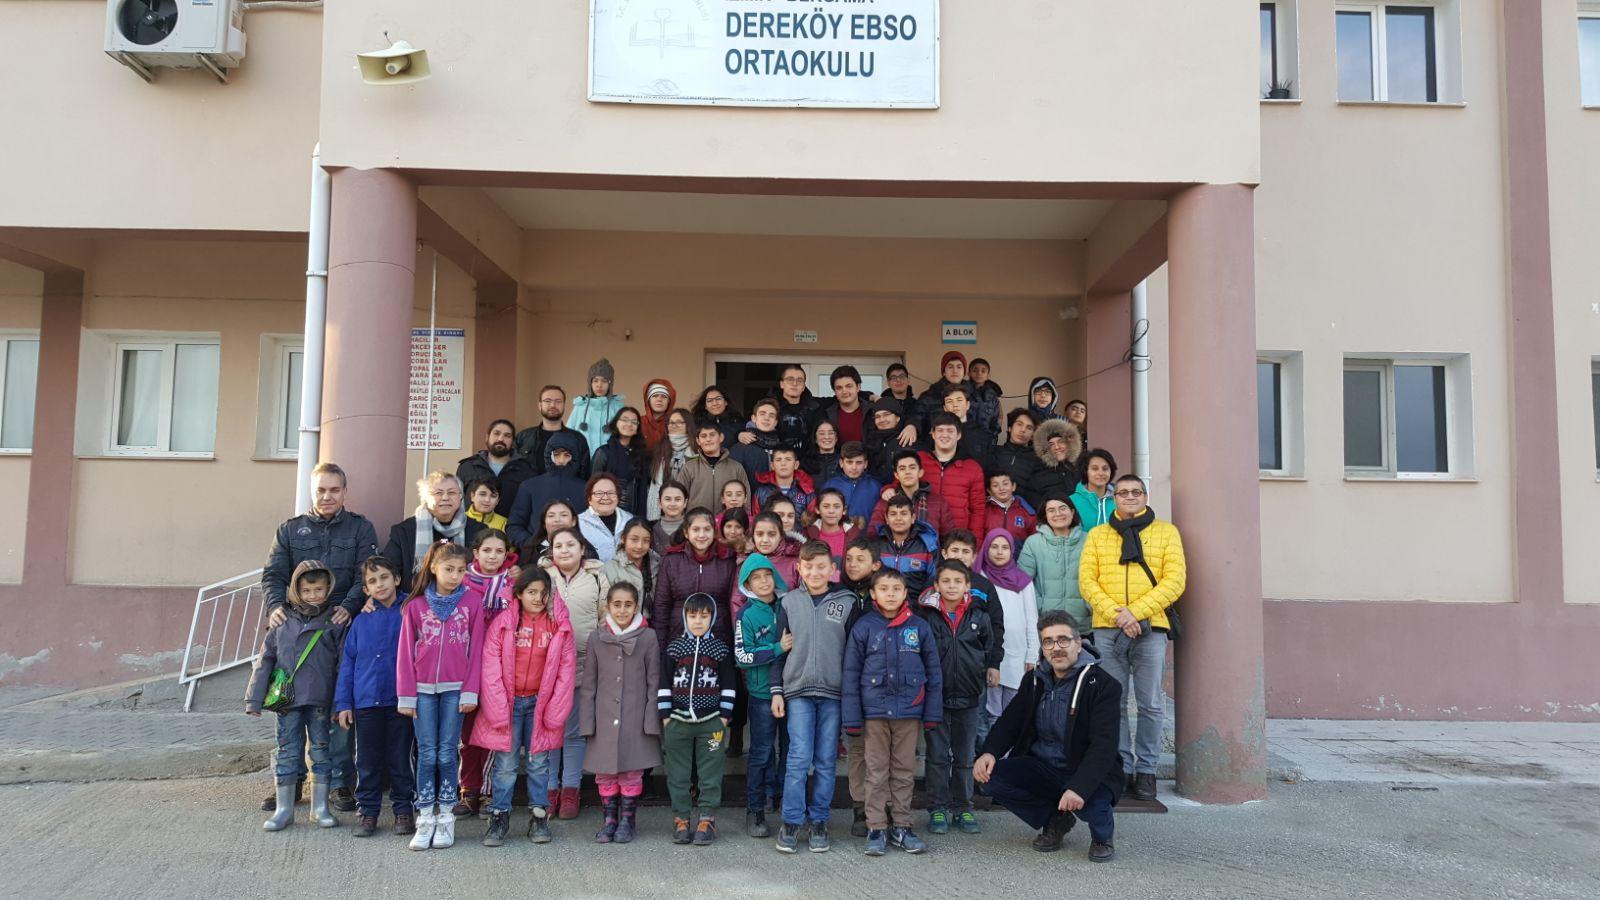 Bergama EBSO Village School